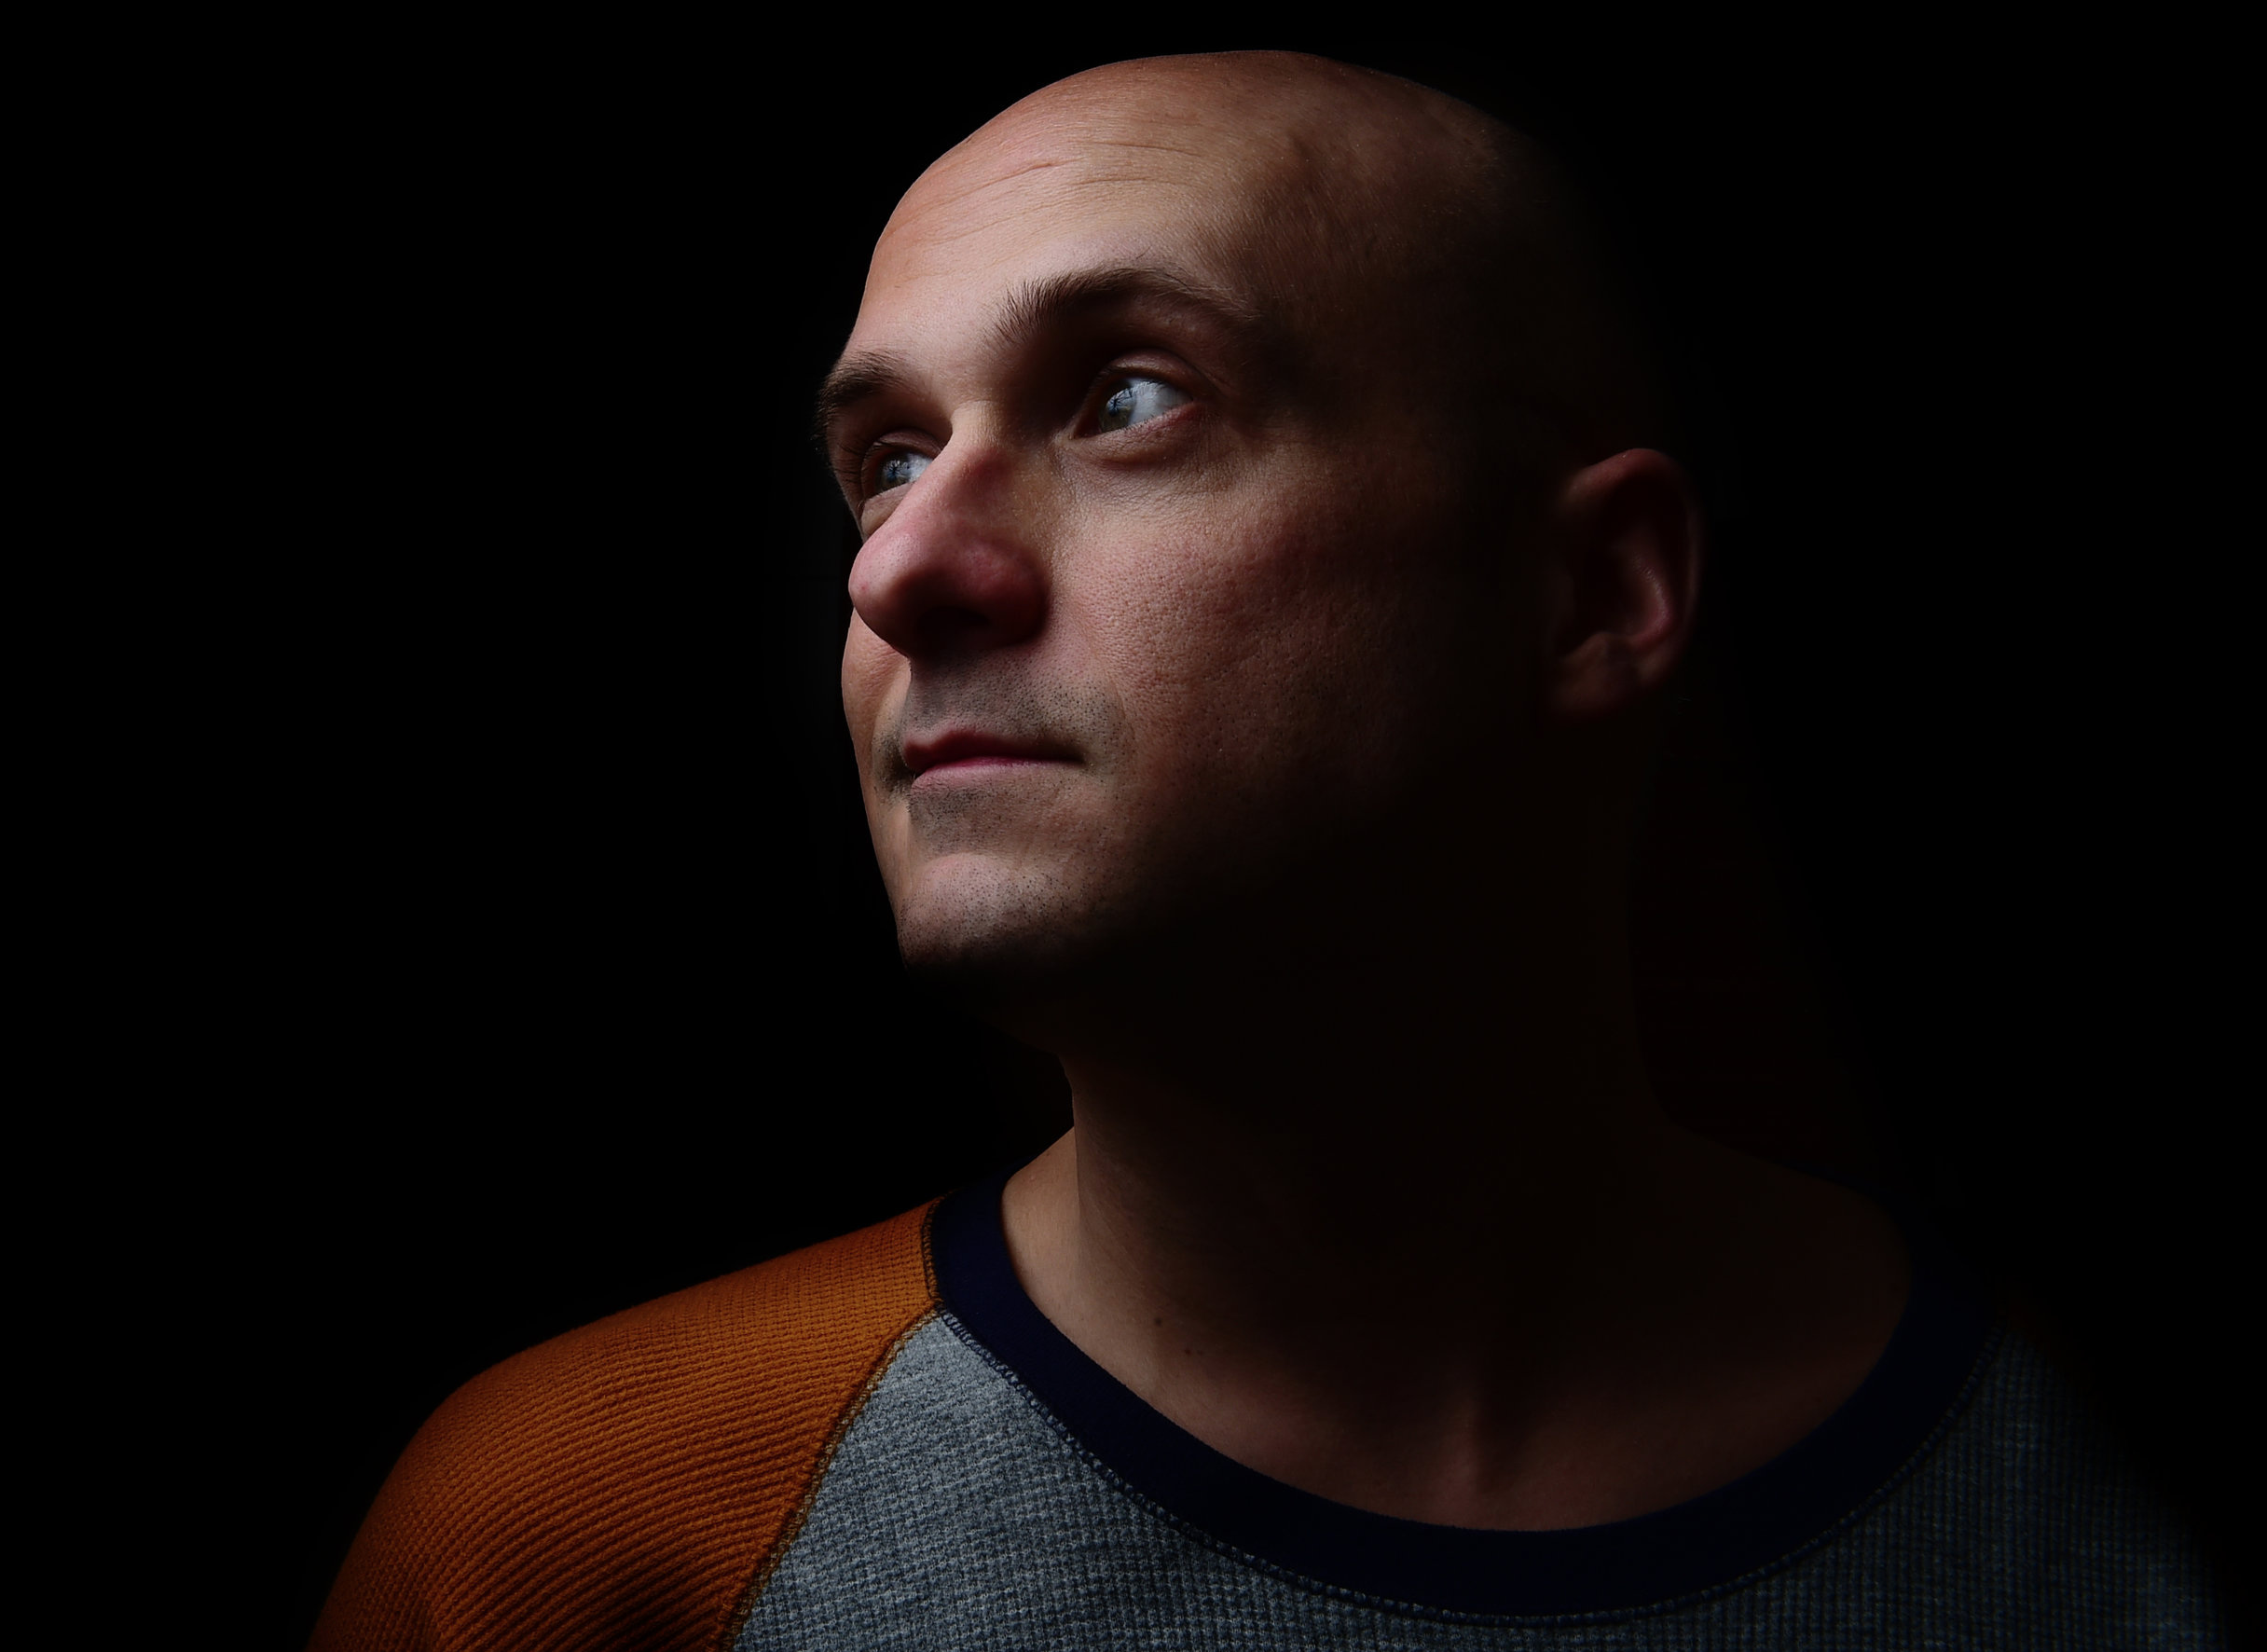 Sean McKeag - owner, Shining Light Studios